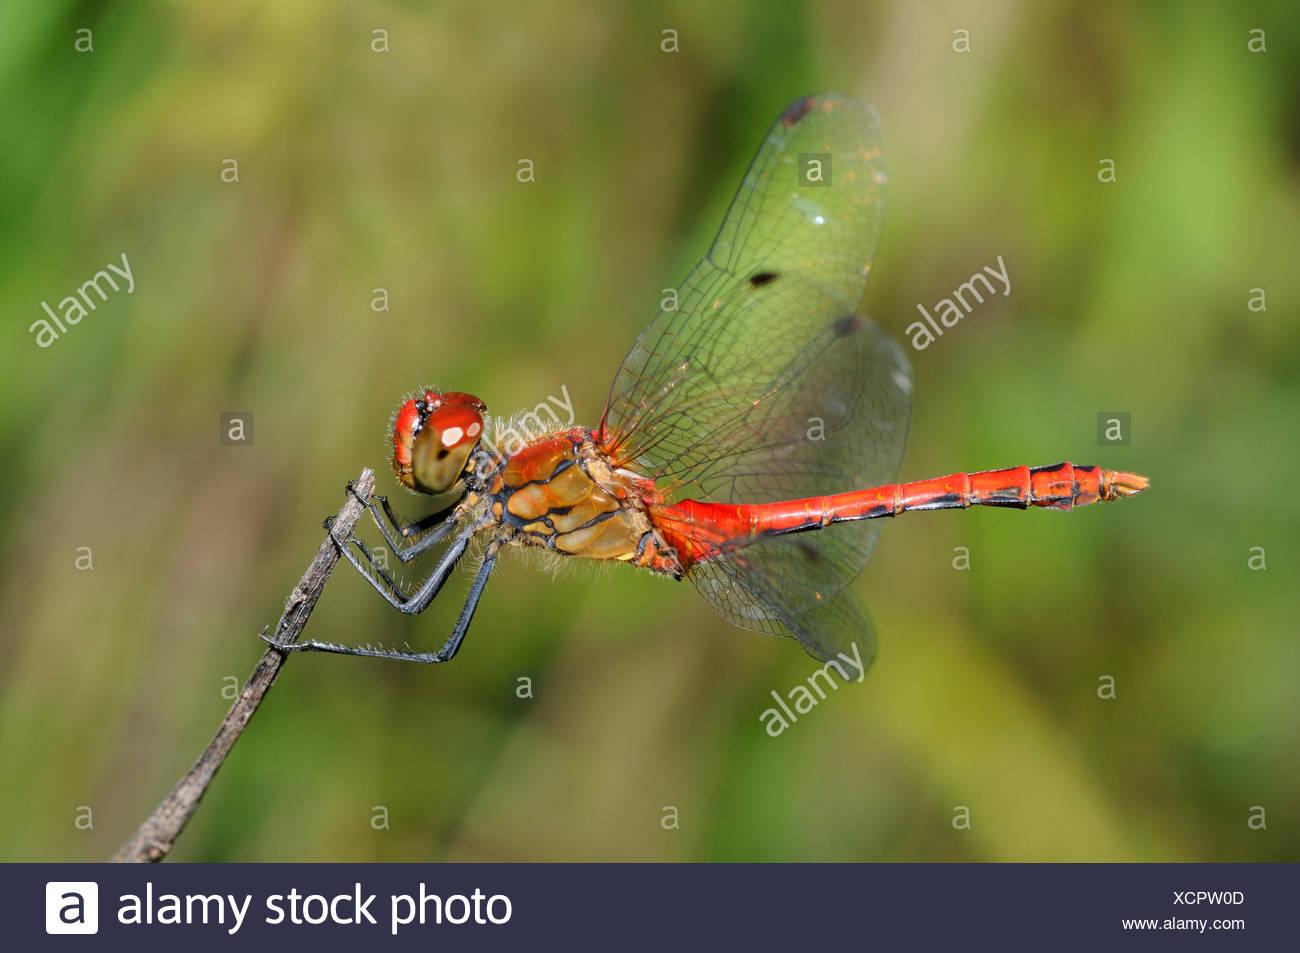 Ruddy Darter on twig - Northern Vosges France - Stock Image